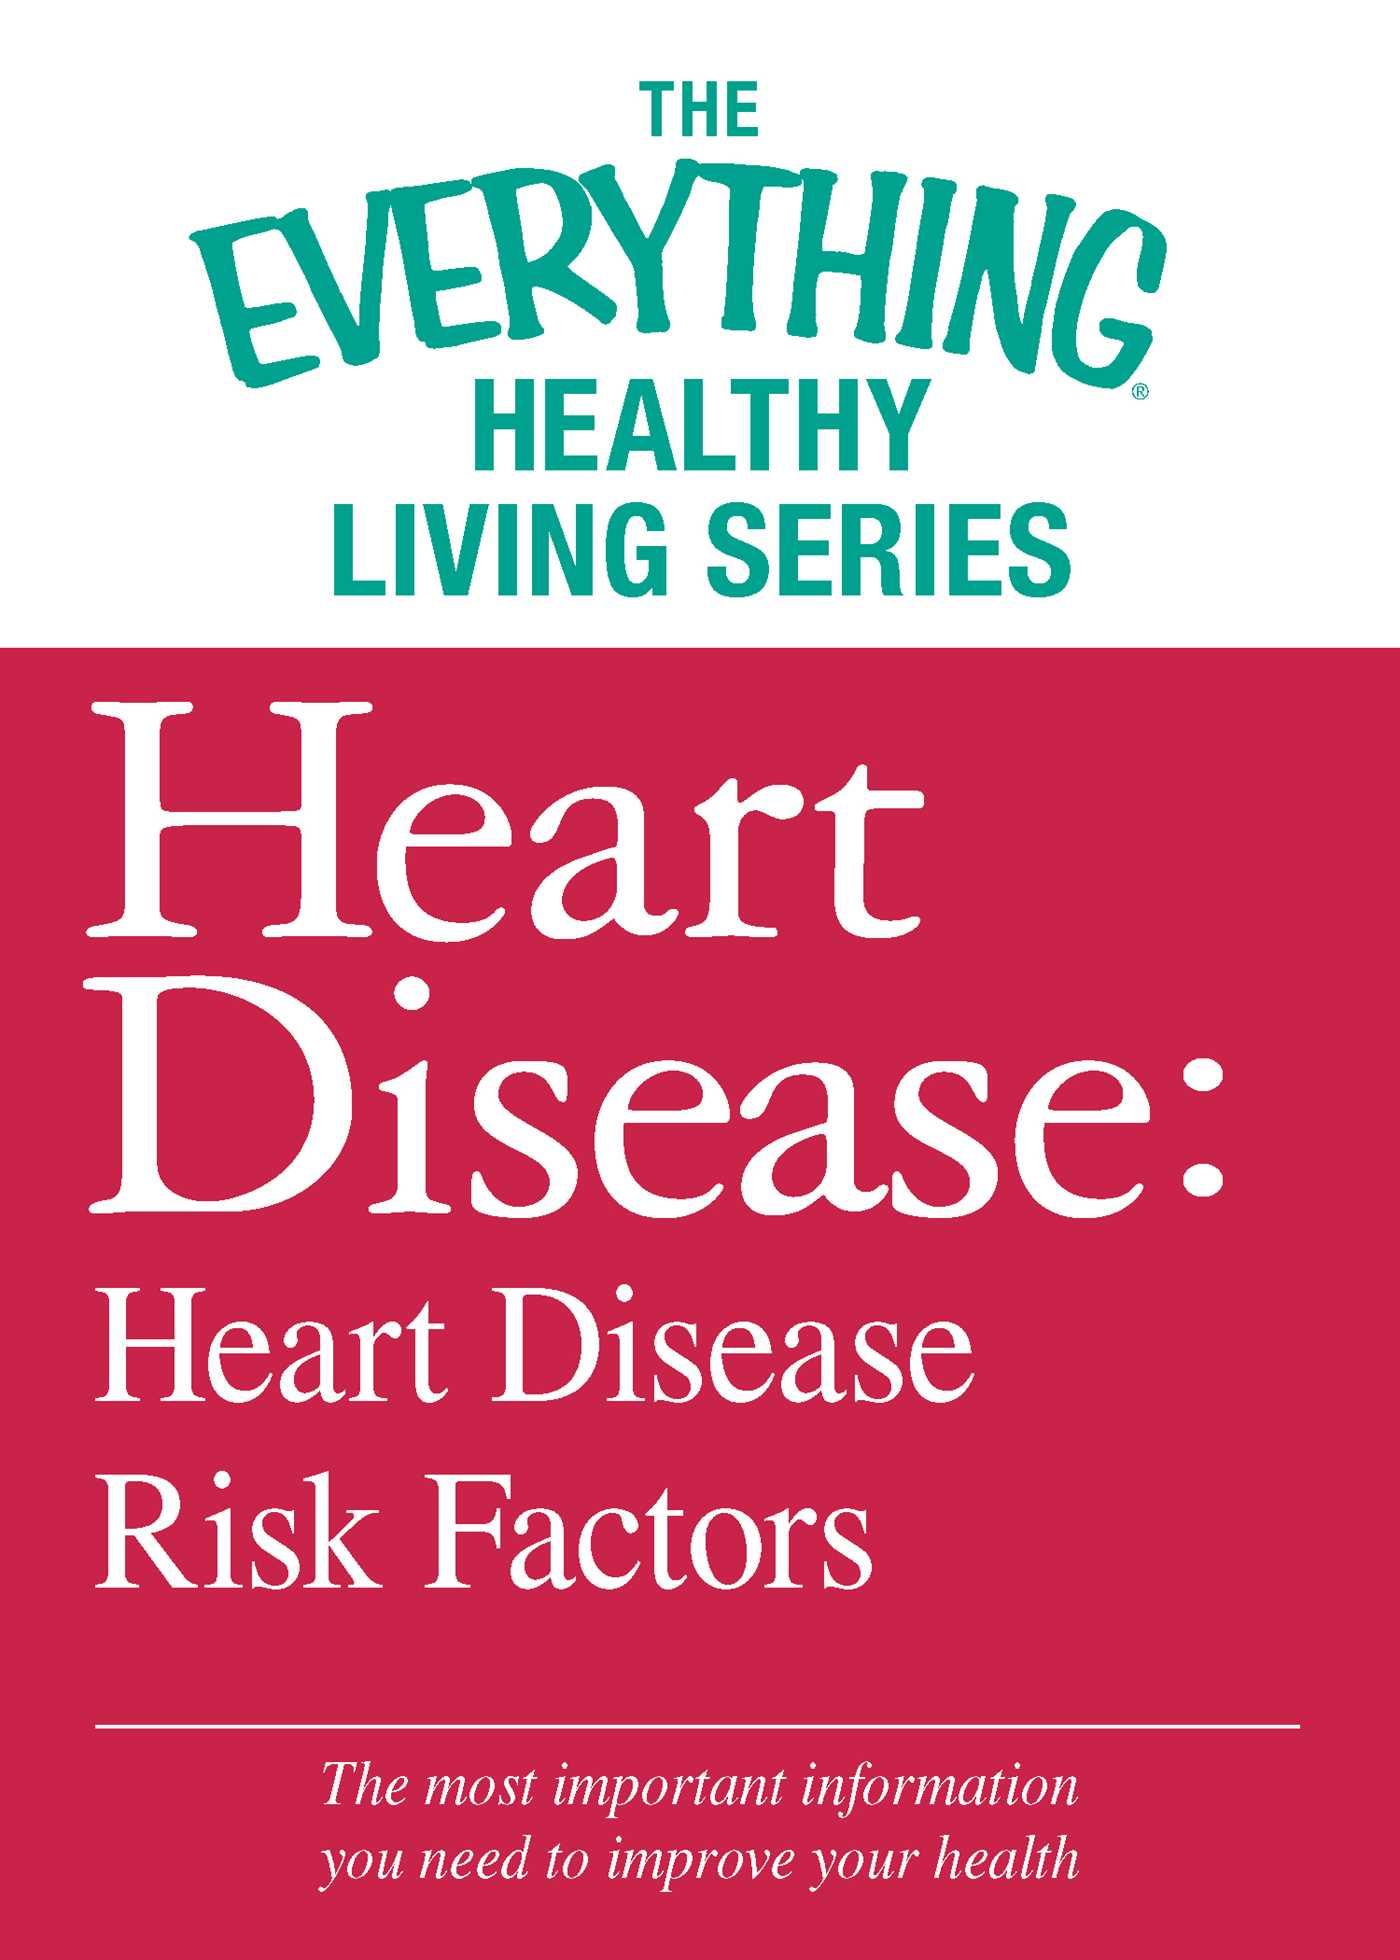 Heart disease heart disease risk factors 9781440565748 hr